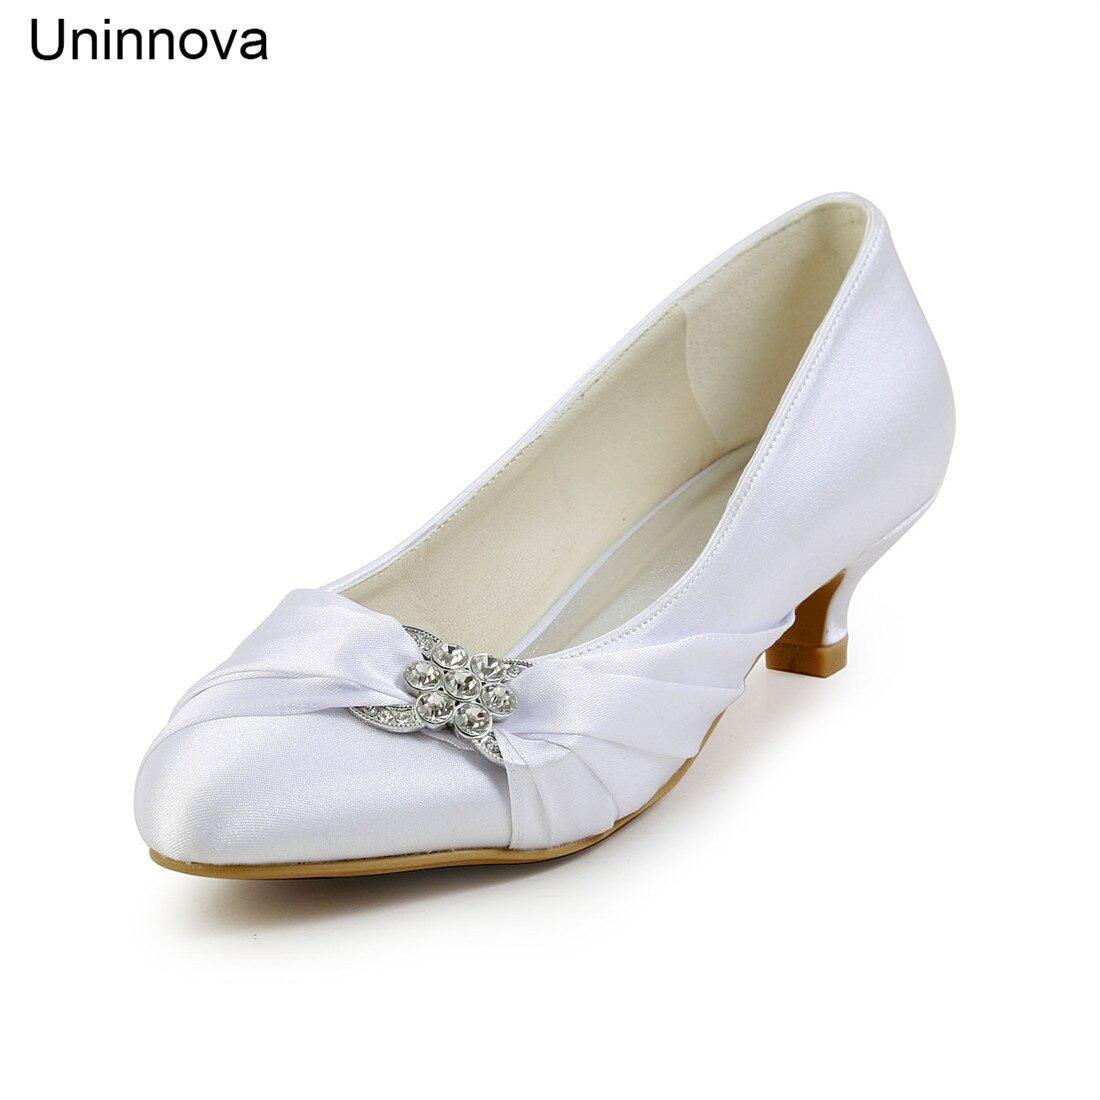 Bridal Bridesmaid Crystal Knot Med Heel Wedding Pumps Round Toe Ivory White Champagne Royal Blue Big